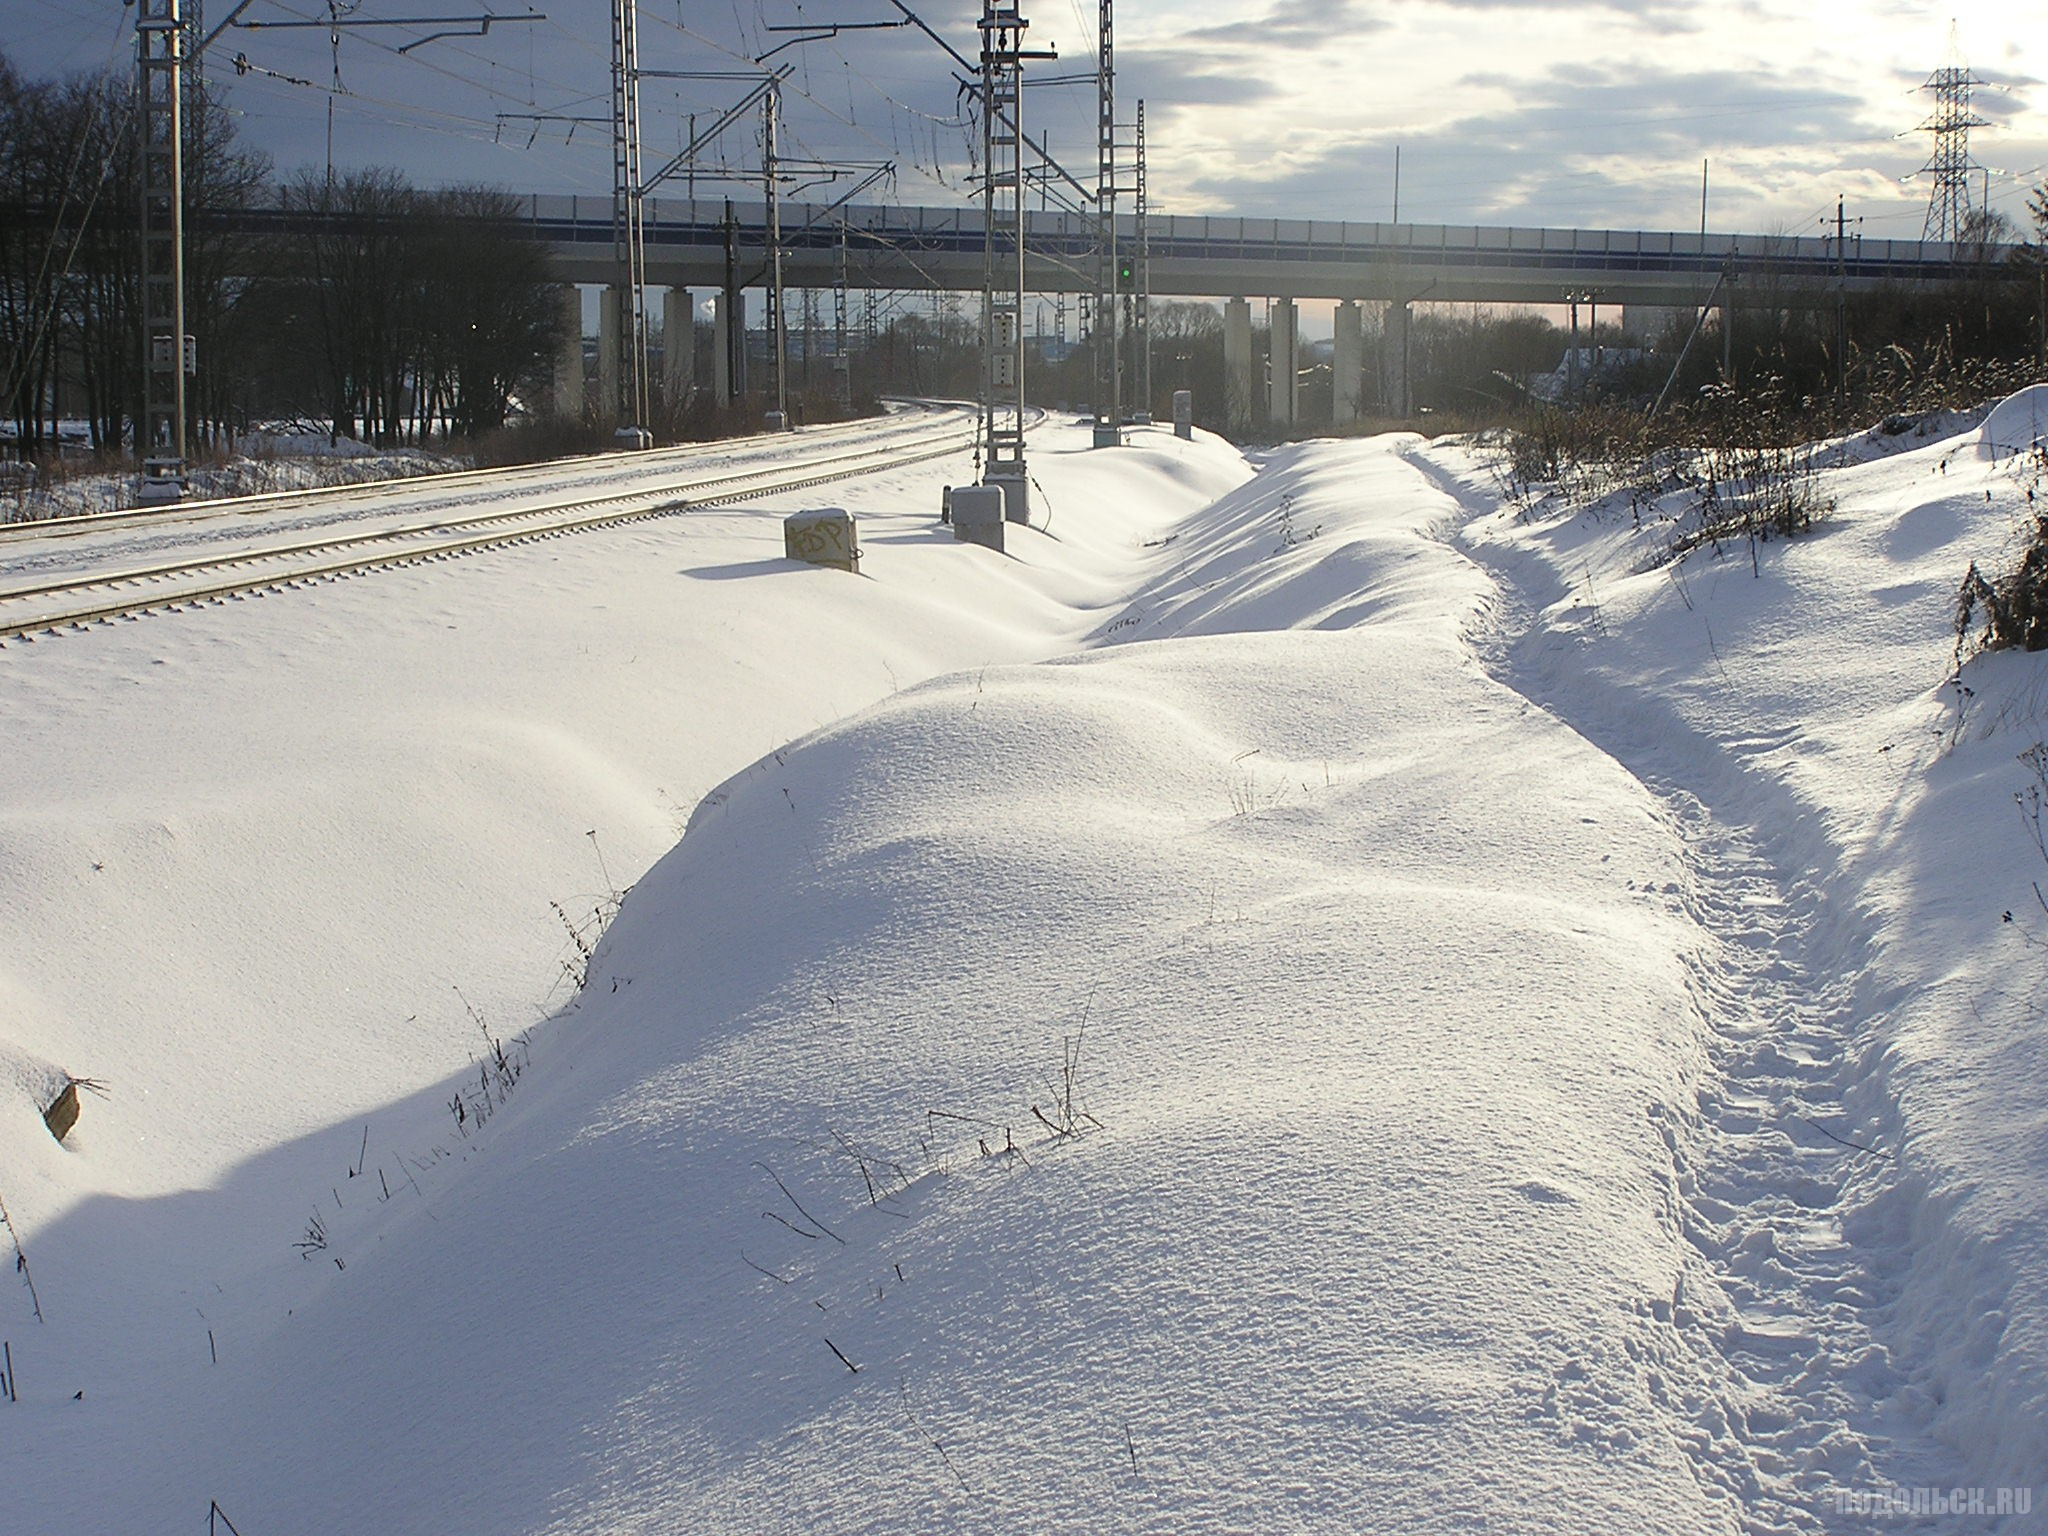 Вид на эстакаду Южного обхода через жд. Весенняя. Янвапь 2016 г.